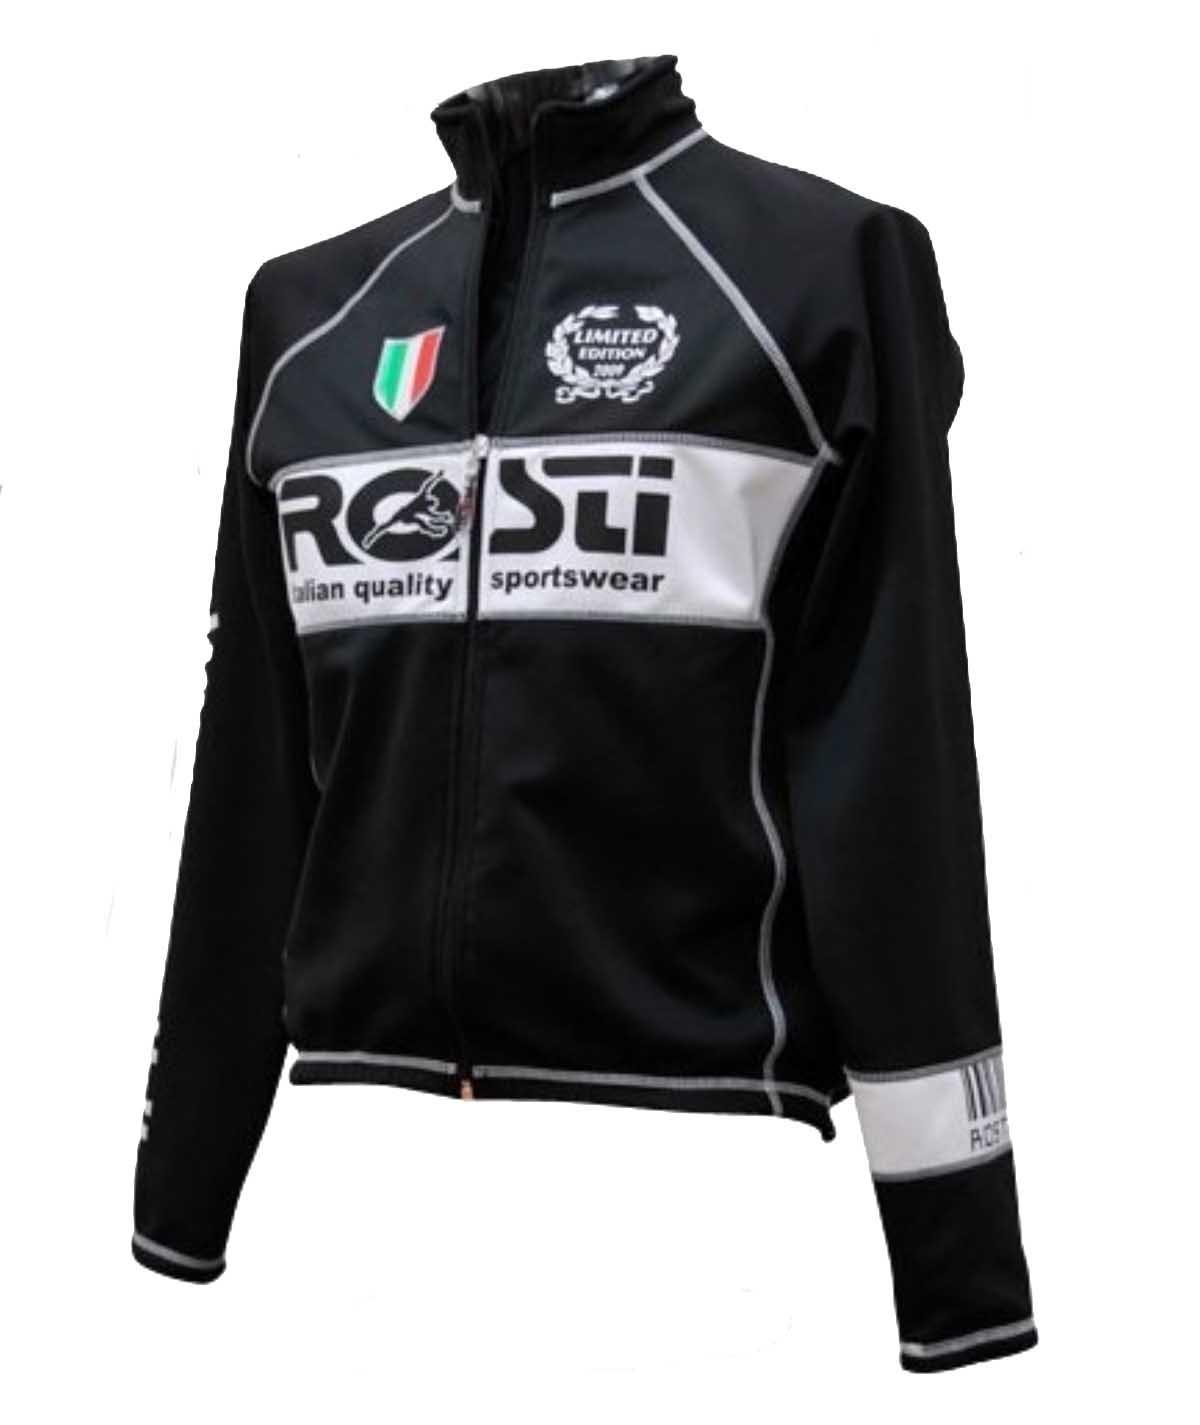 Thermique Rosti Black Edition